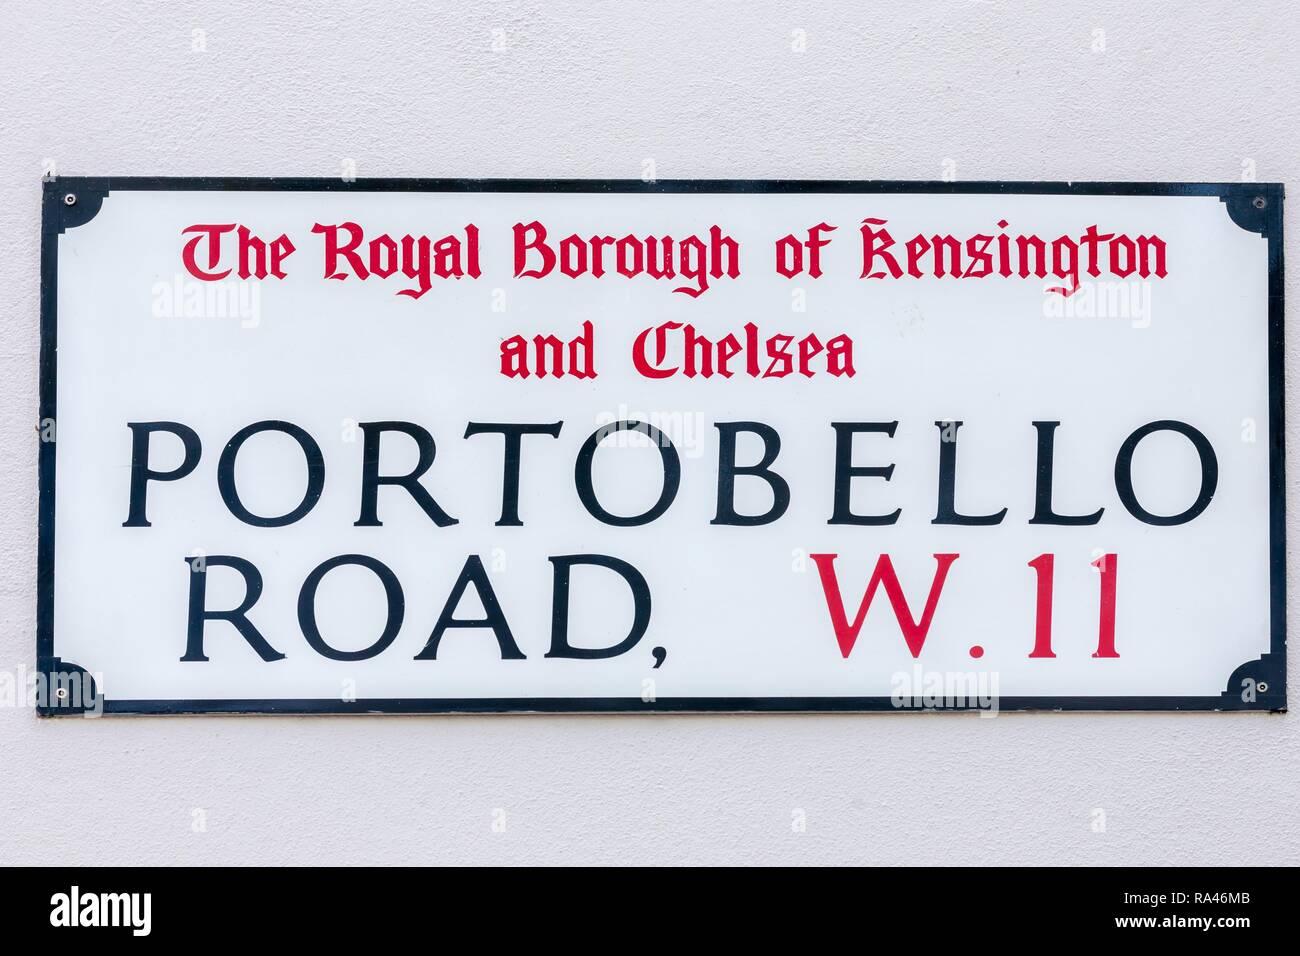 Road sign Portobello Road, Notting Hill, London, Great Britain - Stock Image